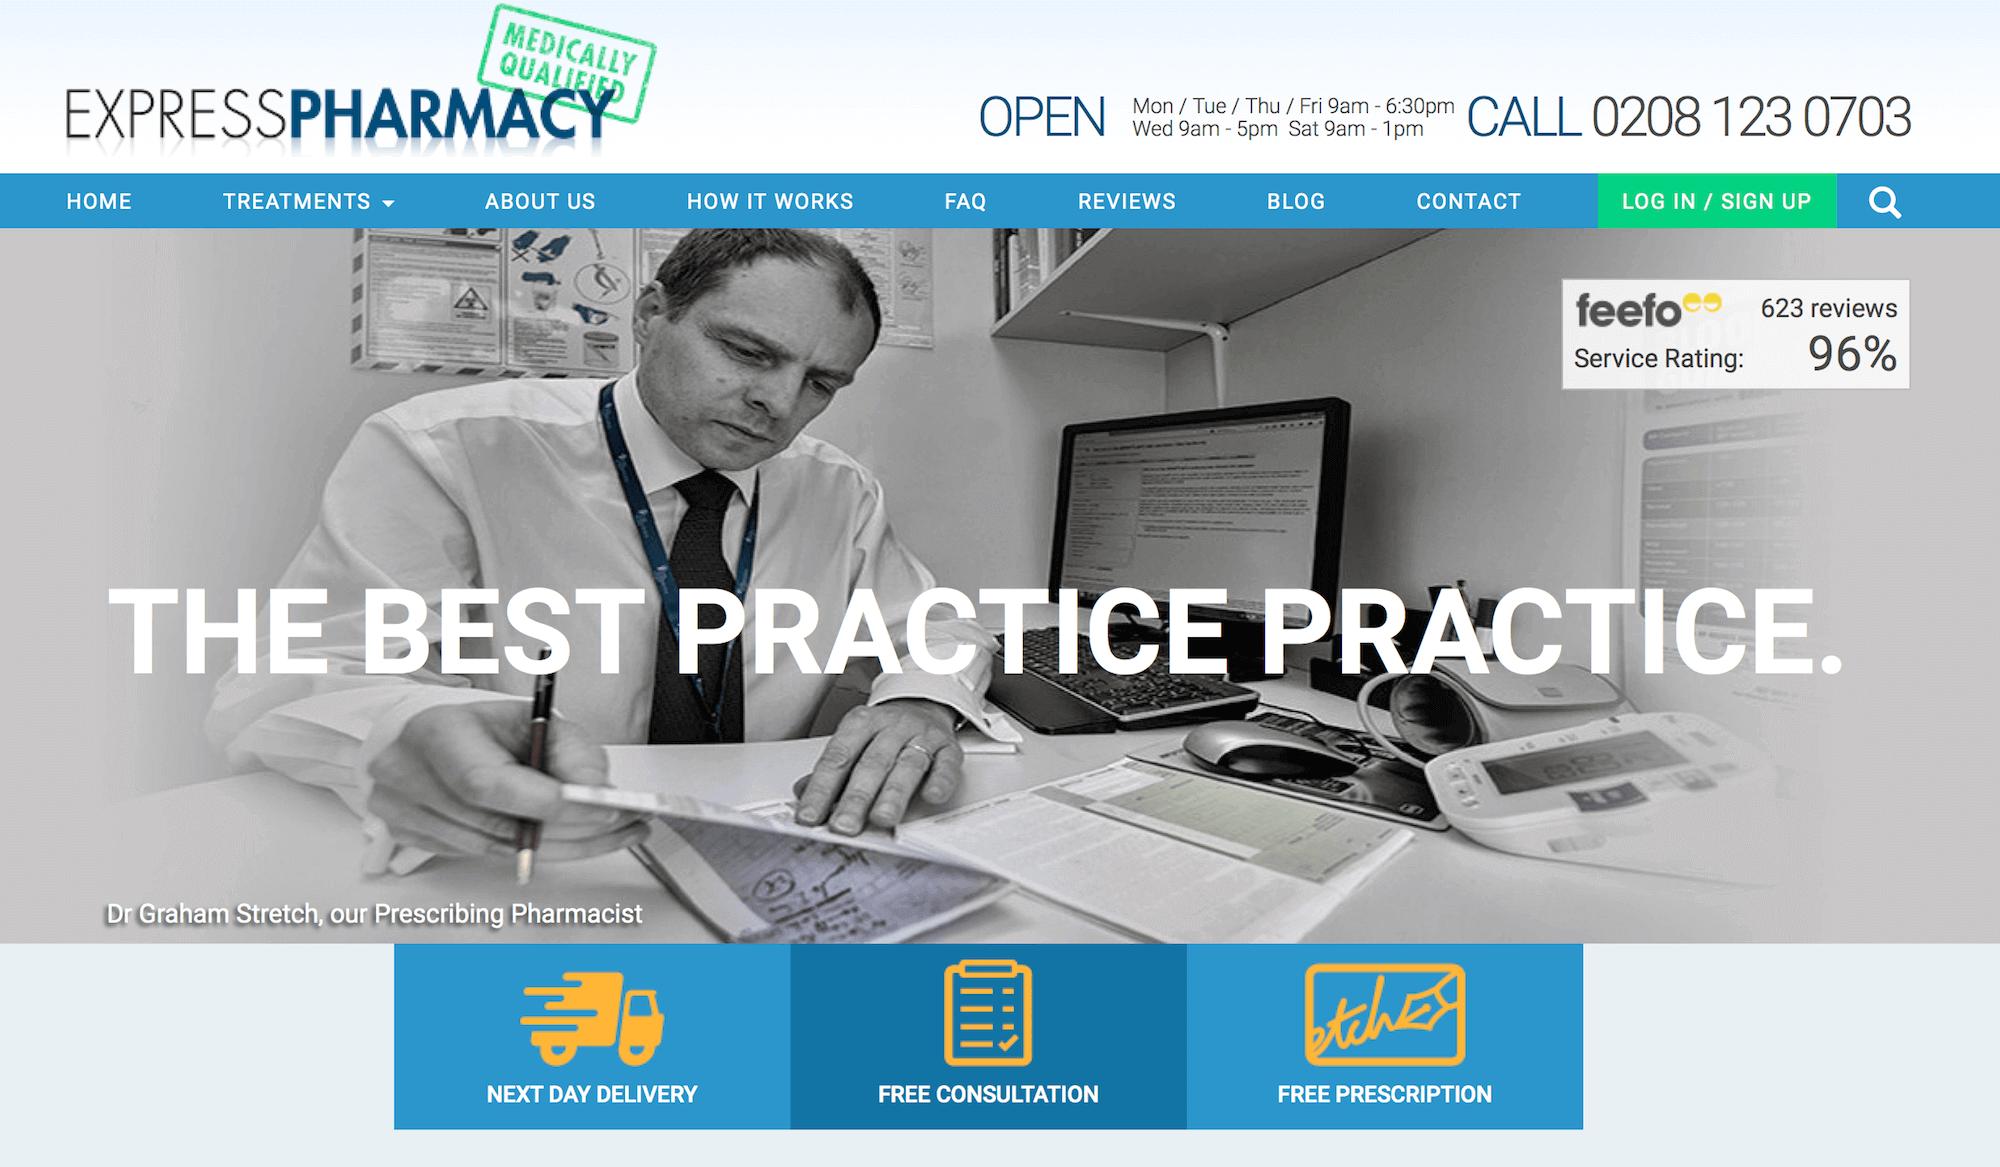 ExpressPharmacy.co.uk Pharmacy Review